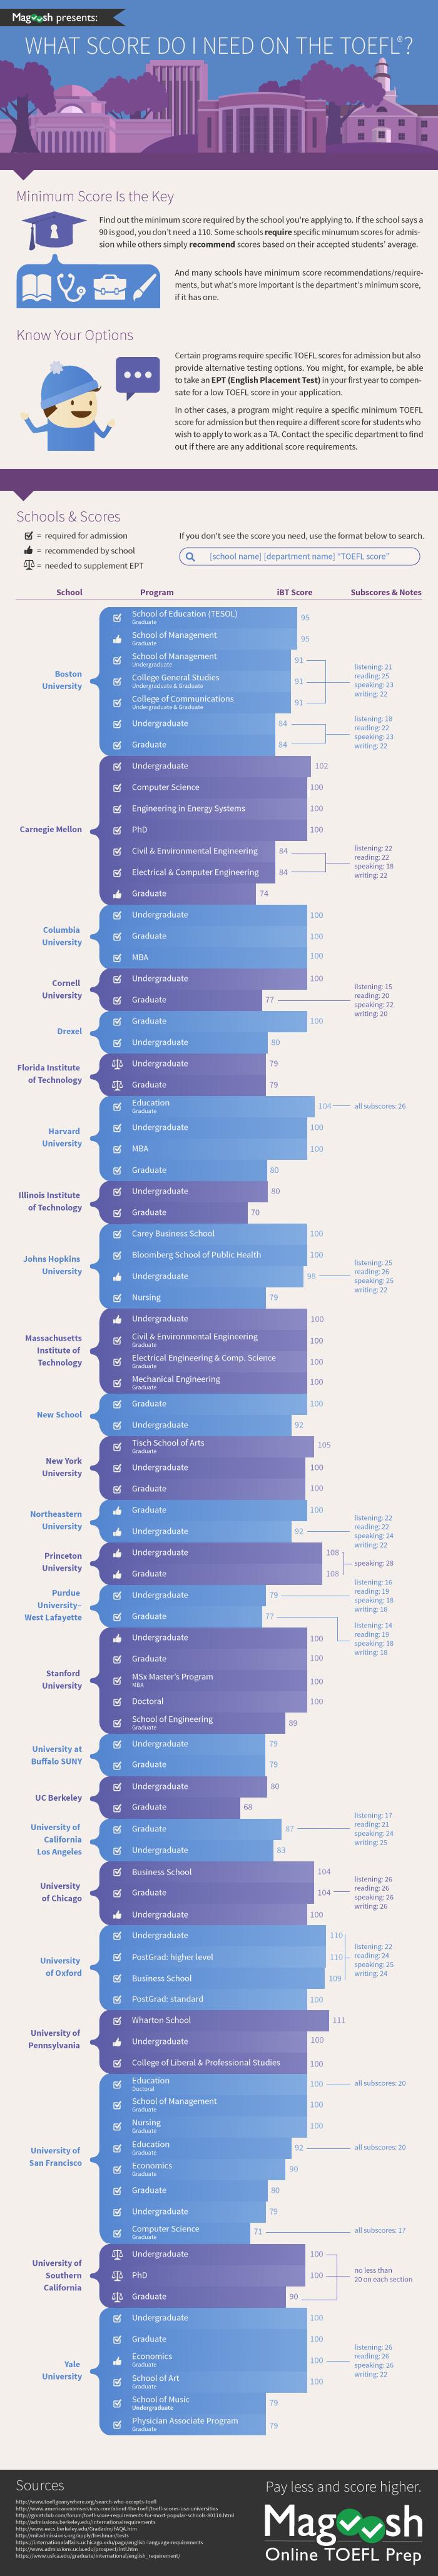 MagooshTOEFL Score Infographic